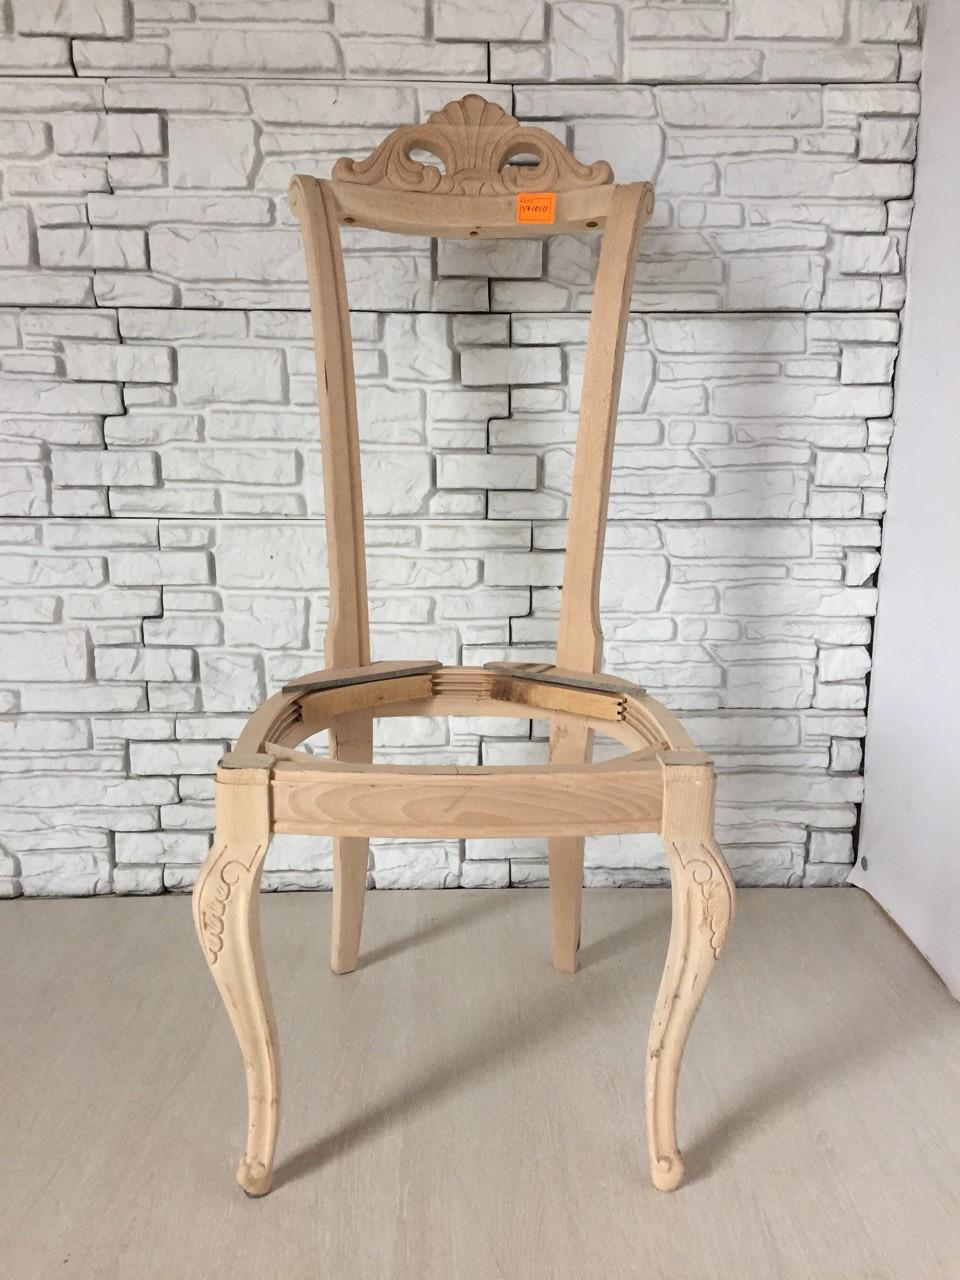 Стул деревянный из Италии. Цена указана за сам каркас.